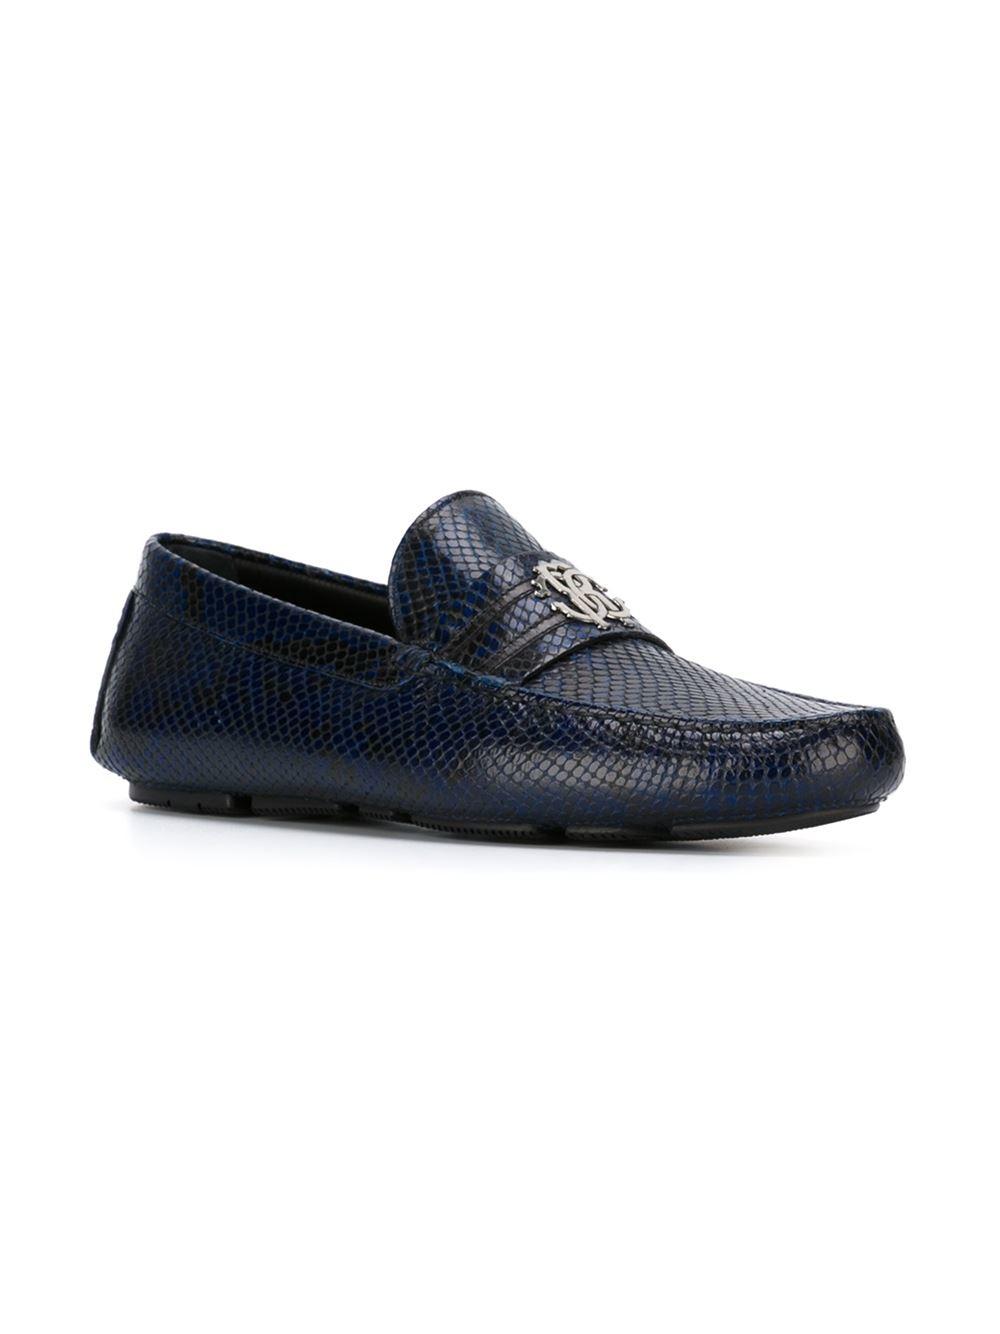 Roberto Cavalli Snakeskin Loafers In Blue For Men Lyst